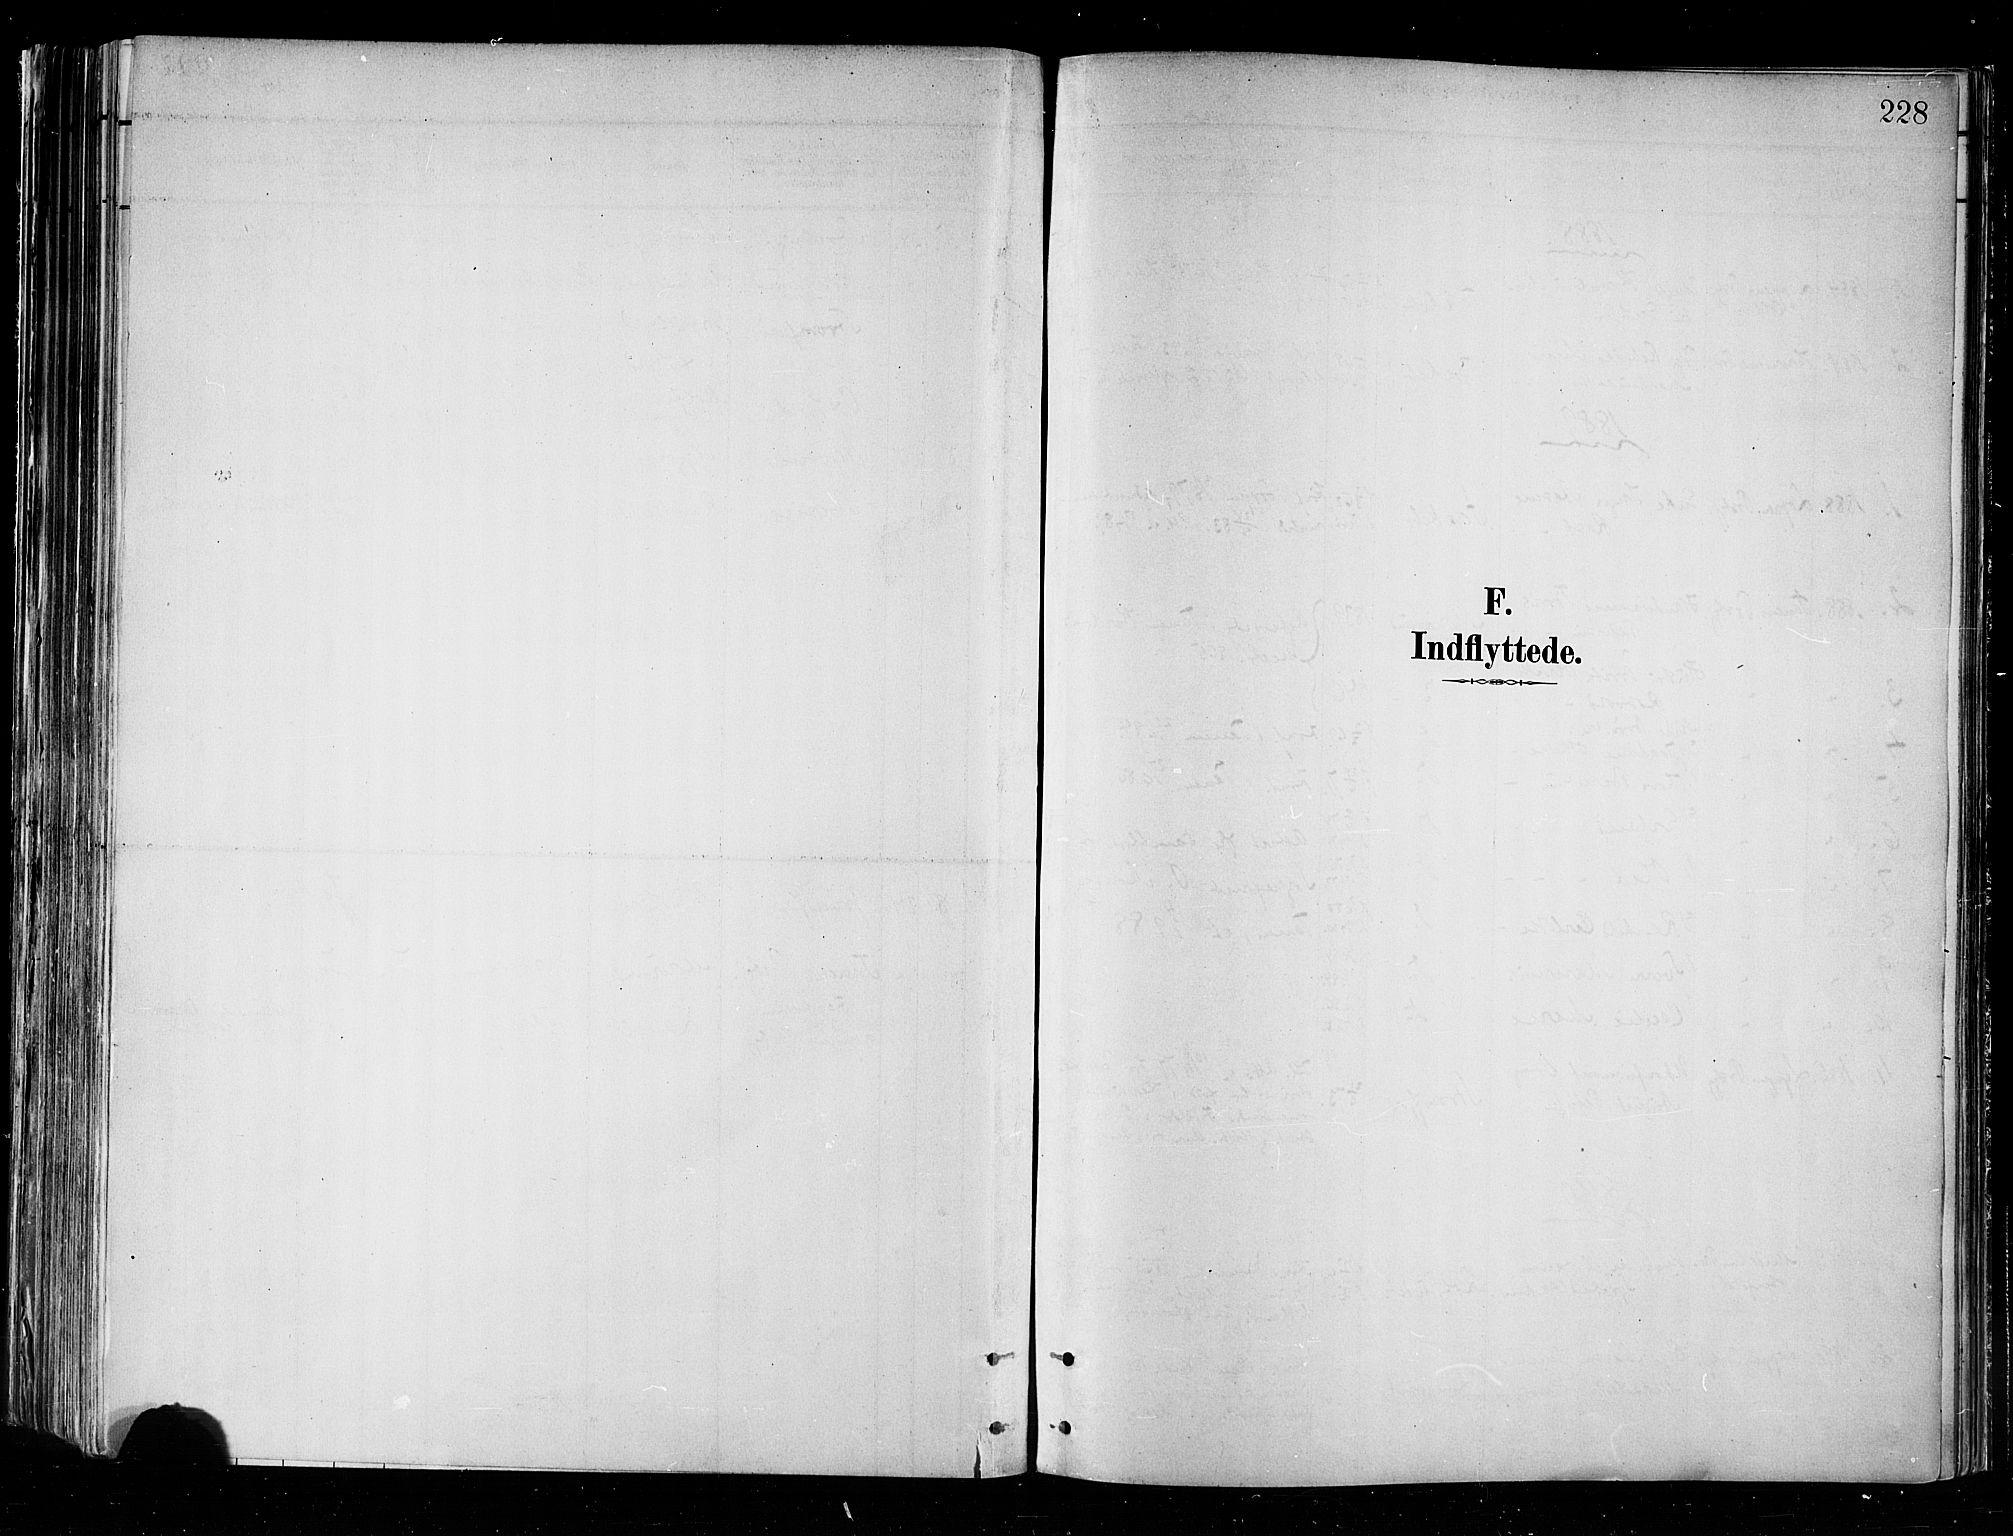 SATØ, Skjervøy sokneprestkontor, H/Ha/Haa/L0010kirke: Ministerialbok nr. 10, 1887-1898, s. 228